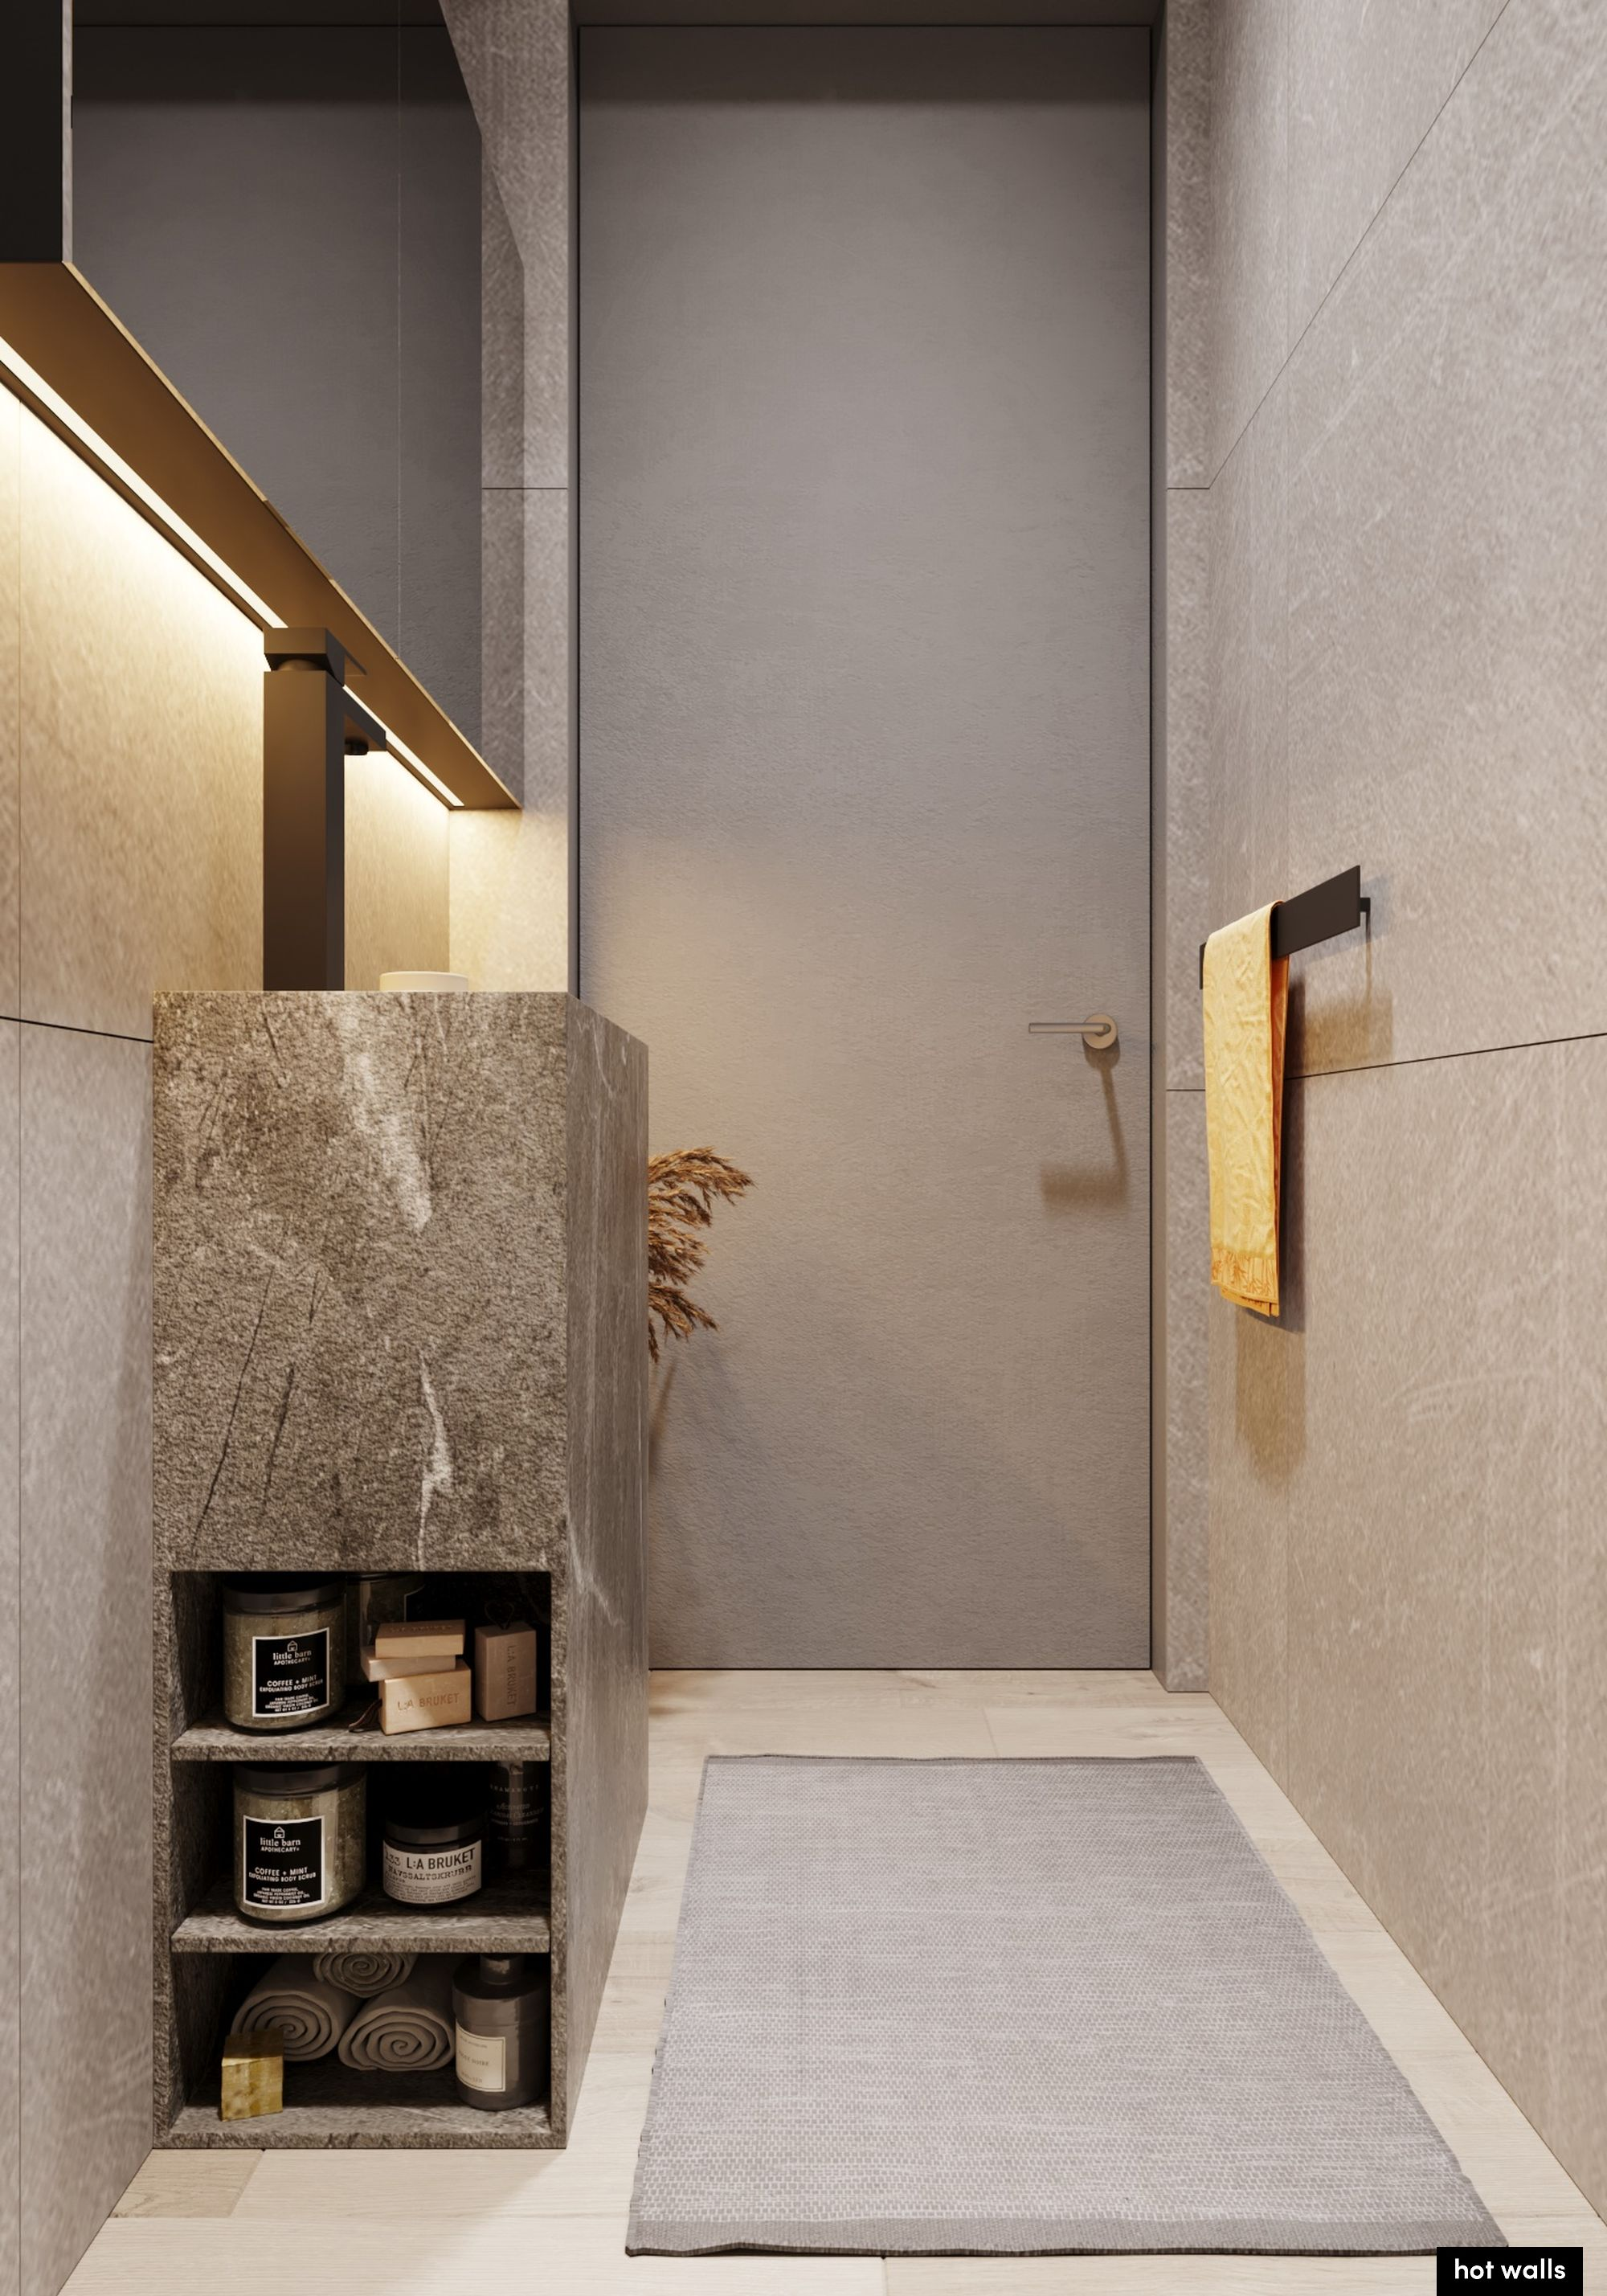 SECOND BATHROOM 3